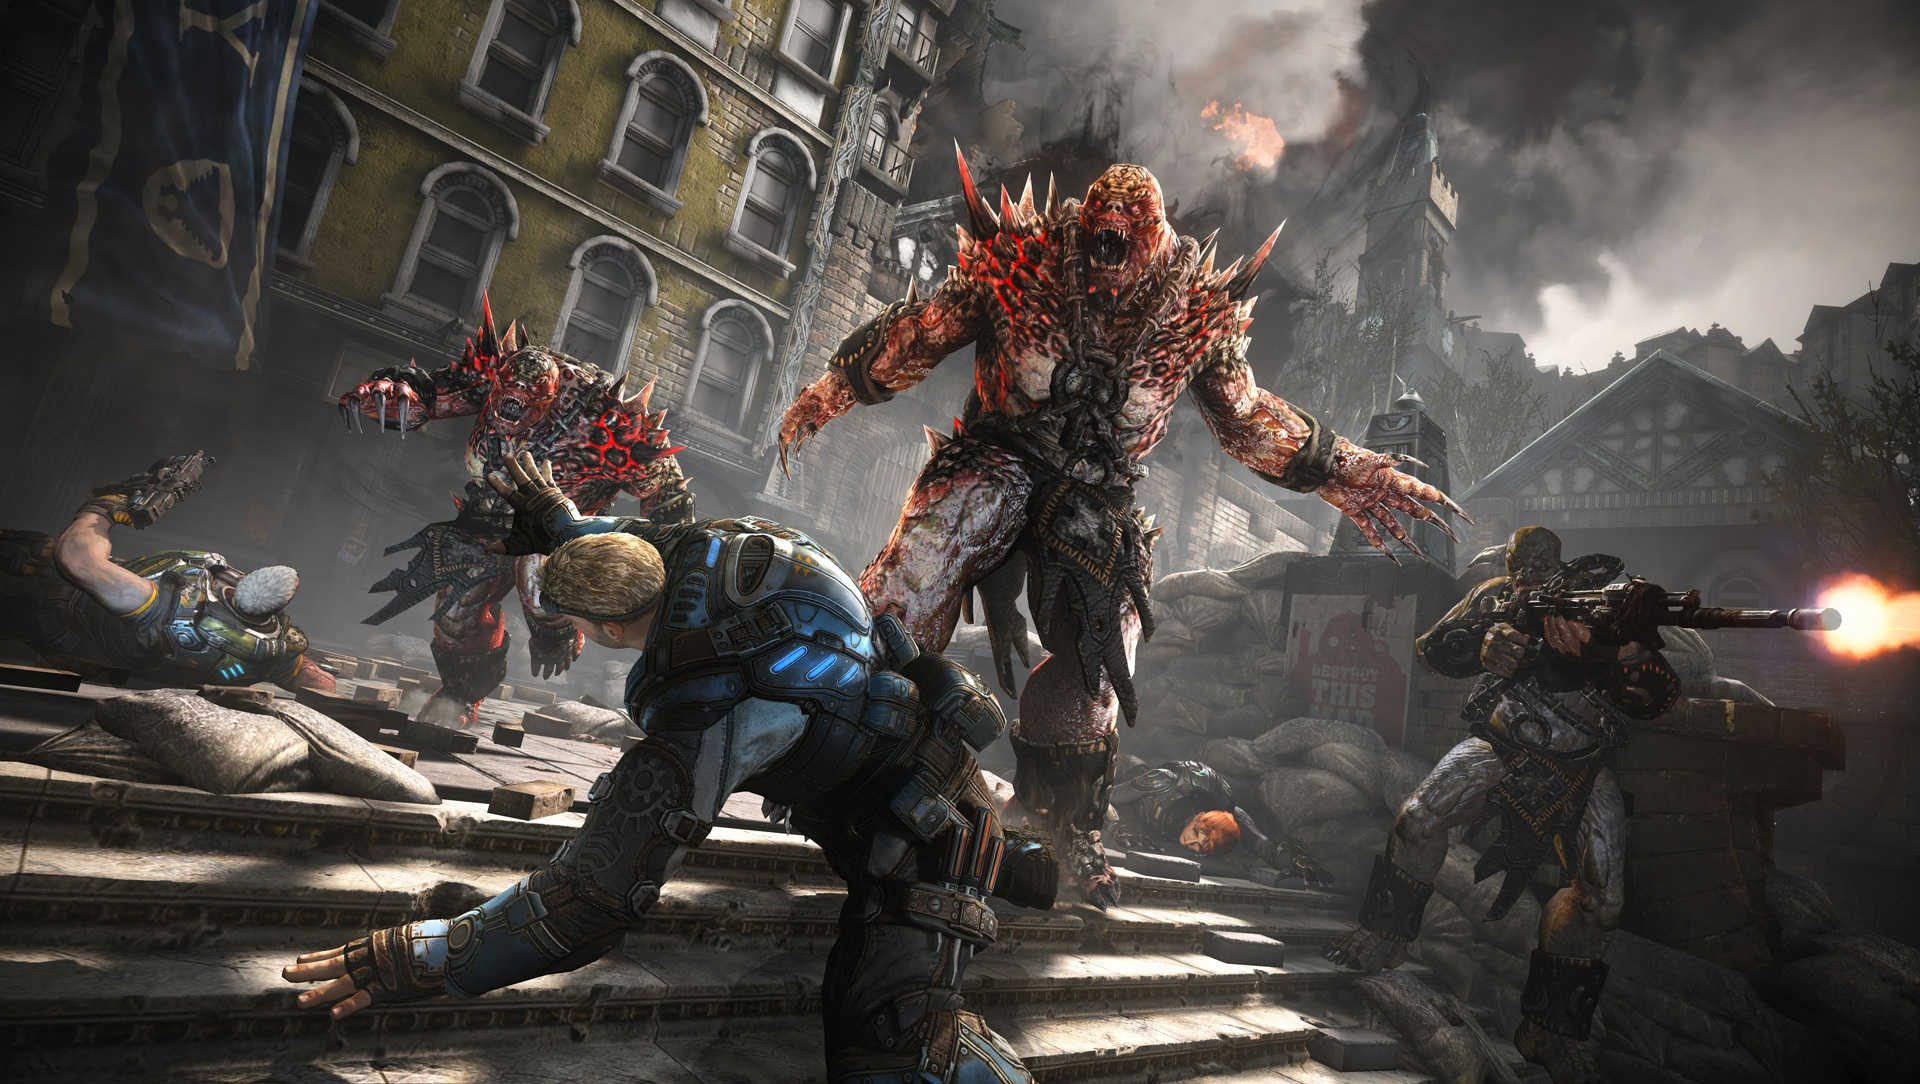 Gears of War: 4 Game